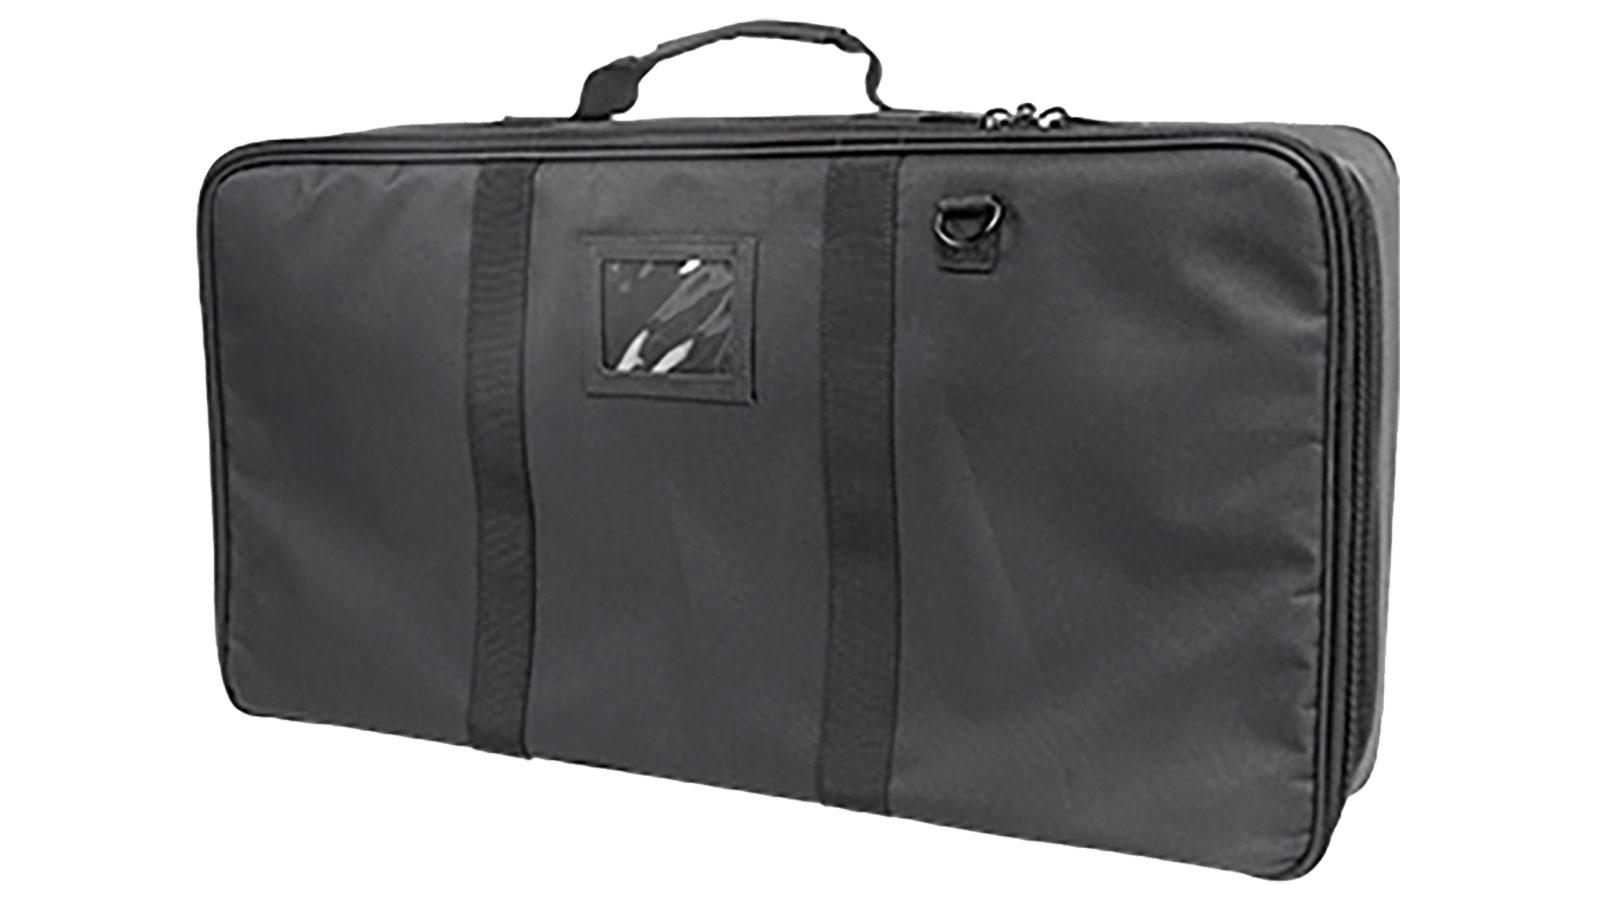 NCStar Discreet Carbine Case|Black|26-inch Lx13H